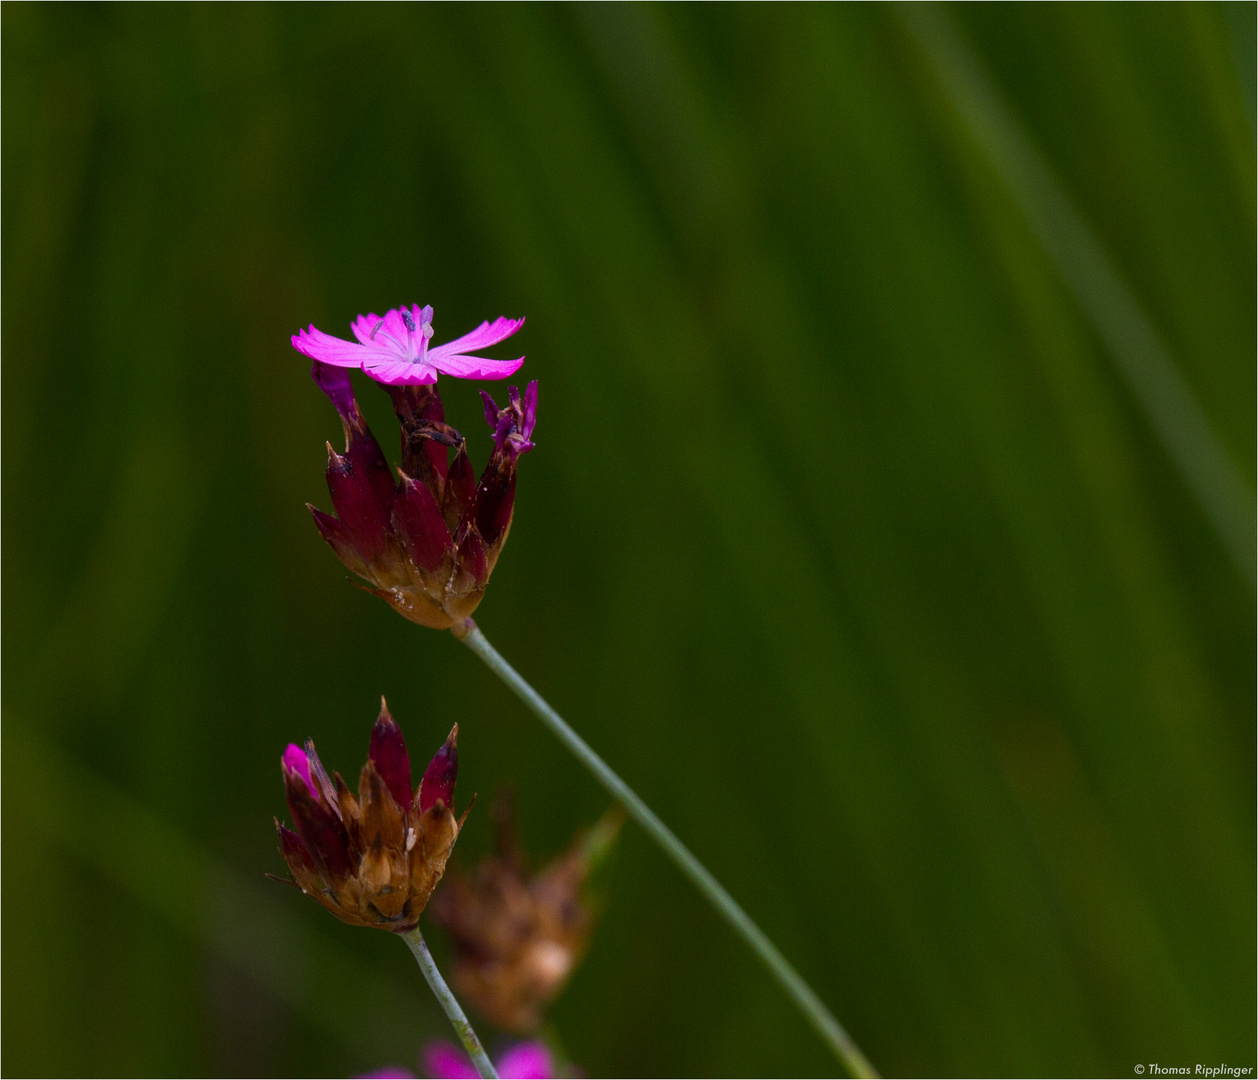 Pannonische Karthäusernelke (Dianthus carthusianorum)